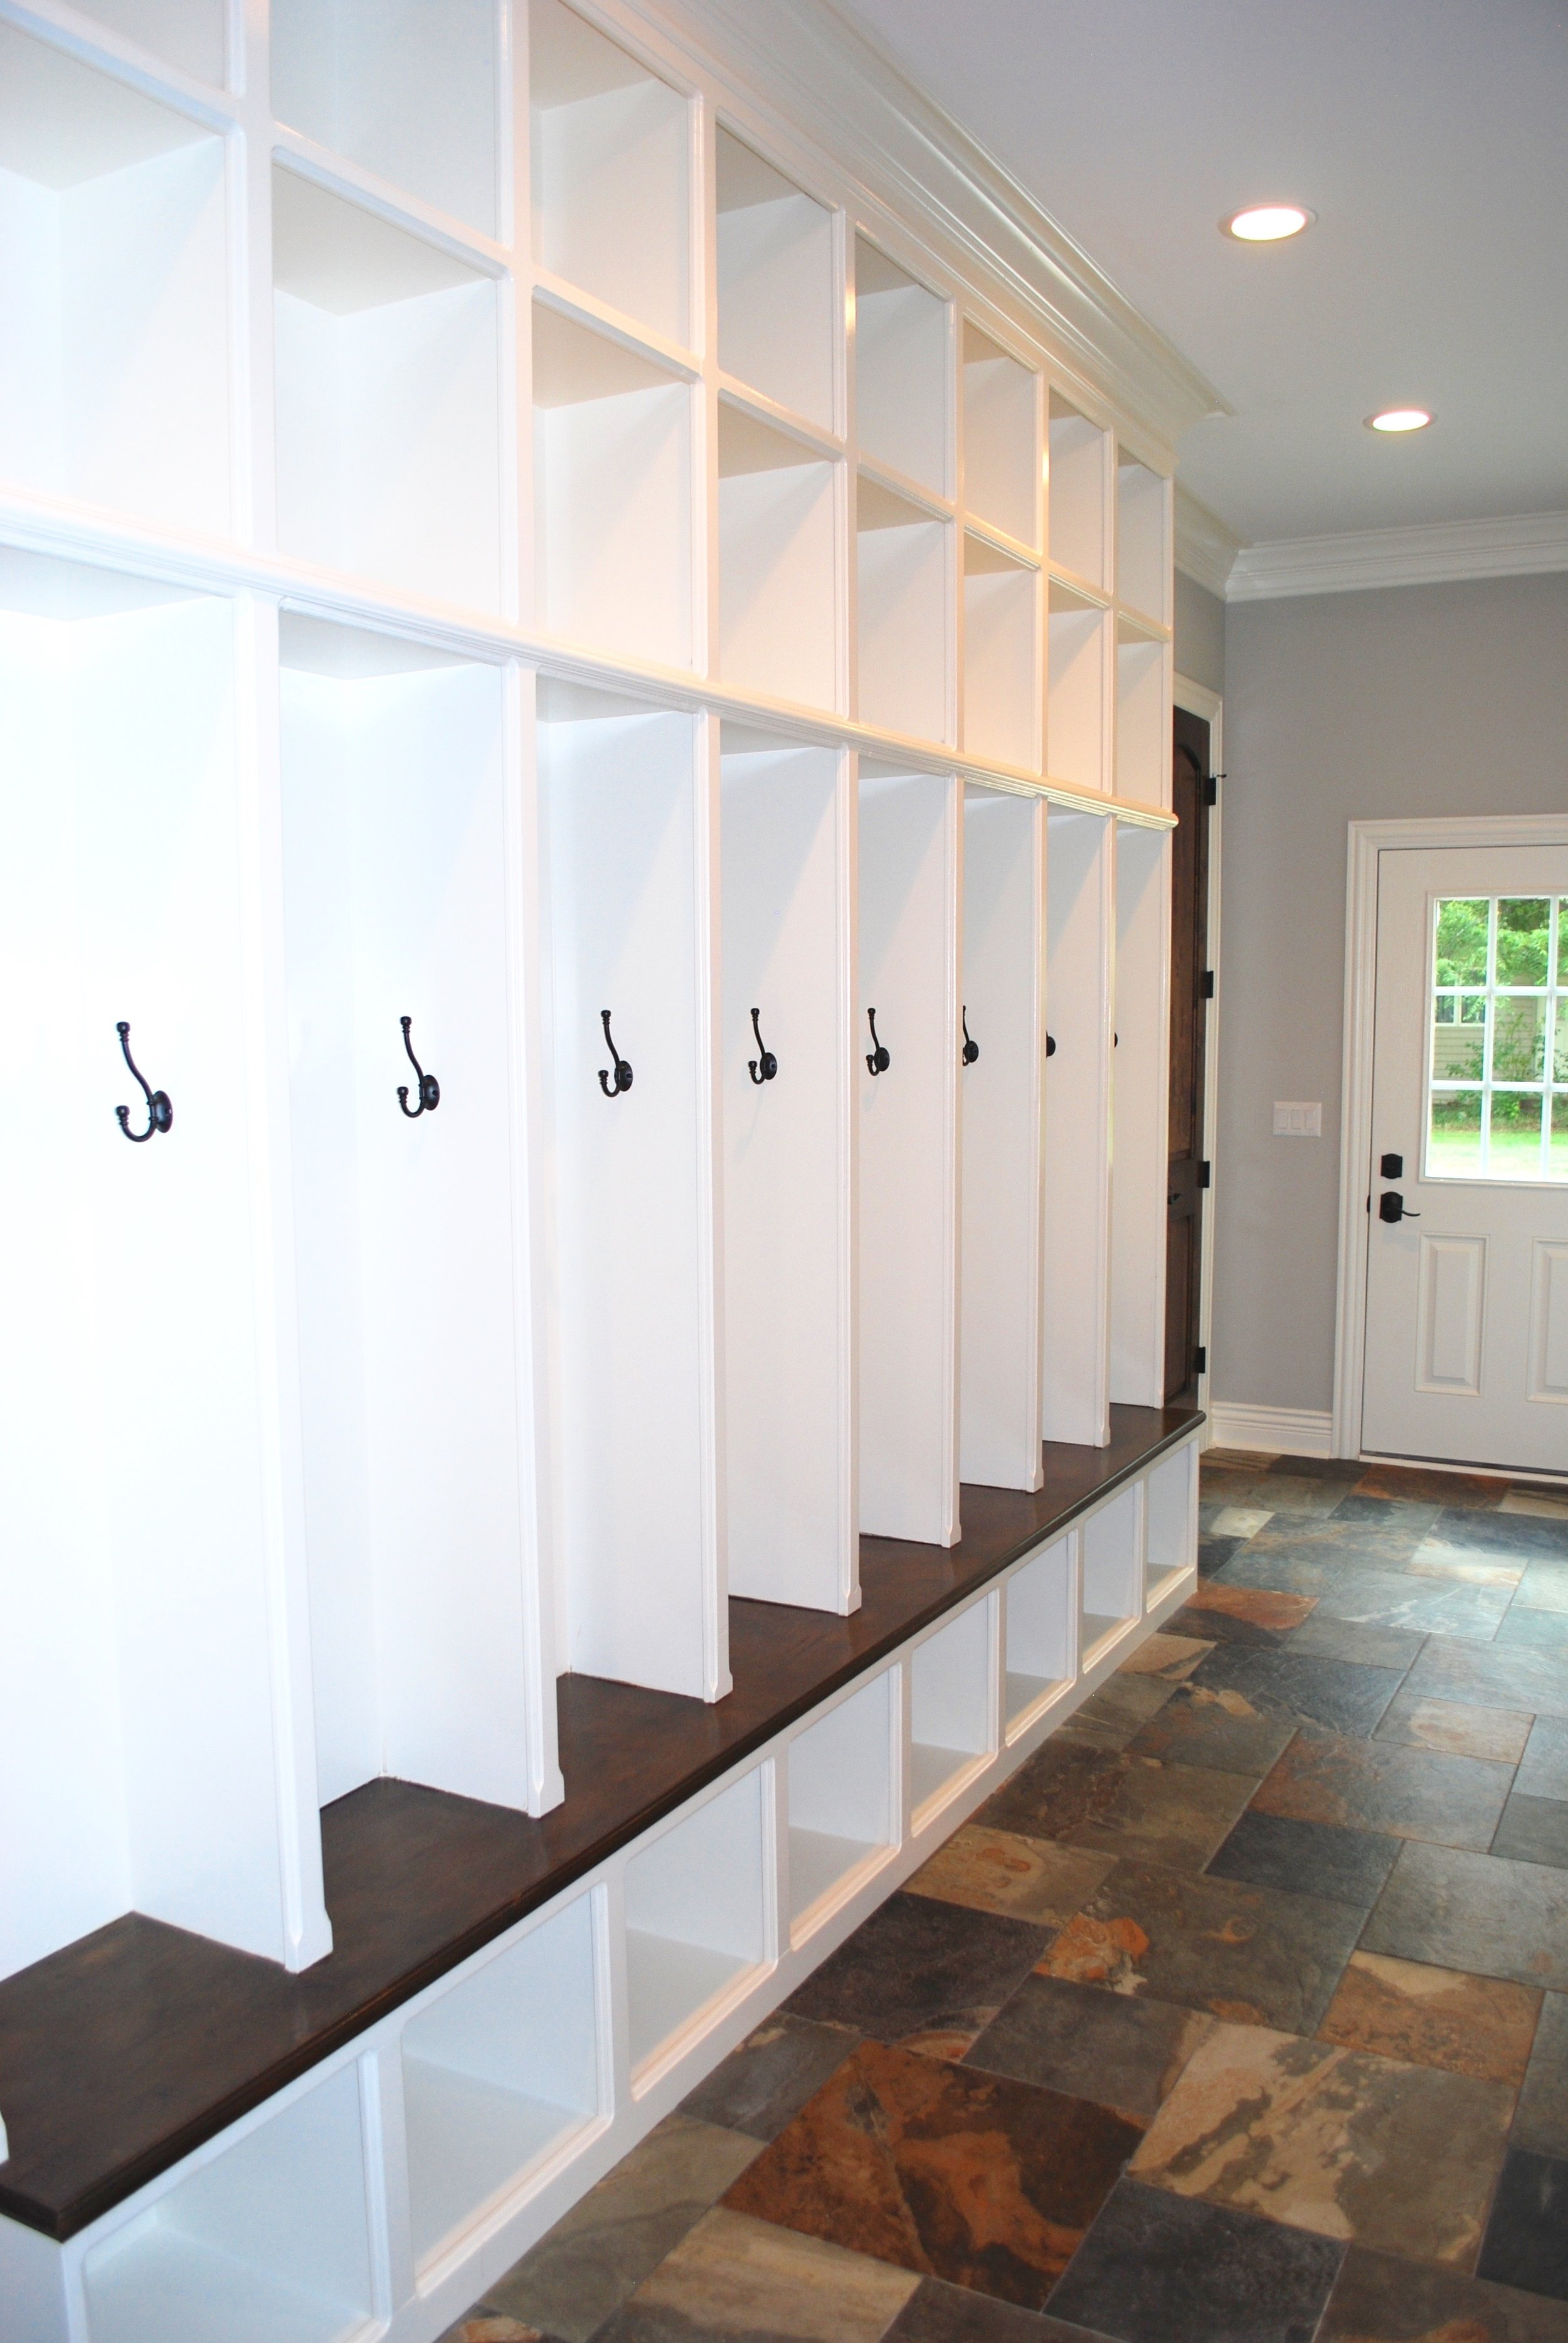 Custom Wooden Lockers & Cubbies Built on Site- Naperville IL.